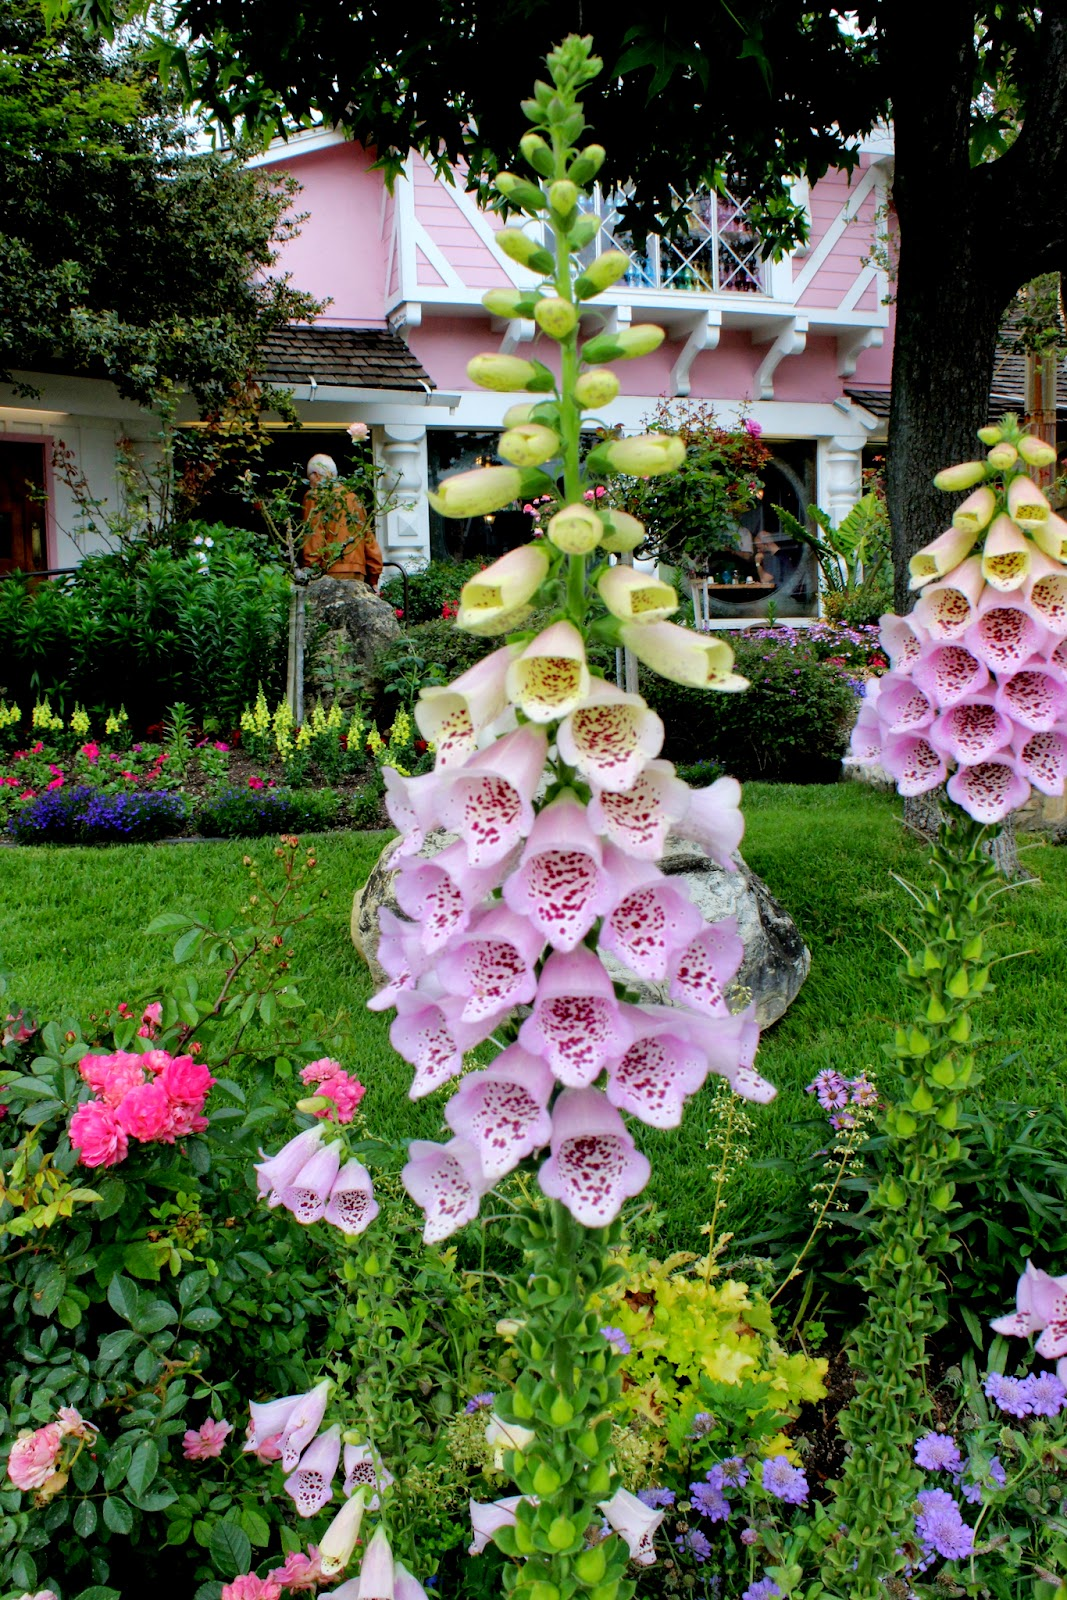 Sweet Helen Grace - The Madonna Inn and San Luis Obispo ...